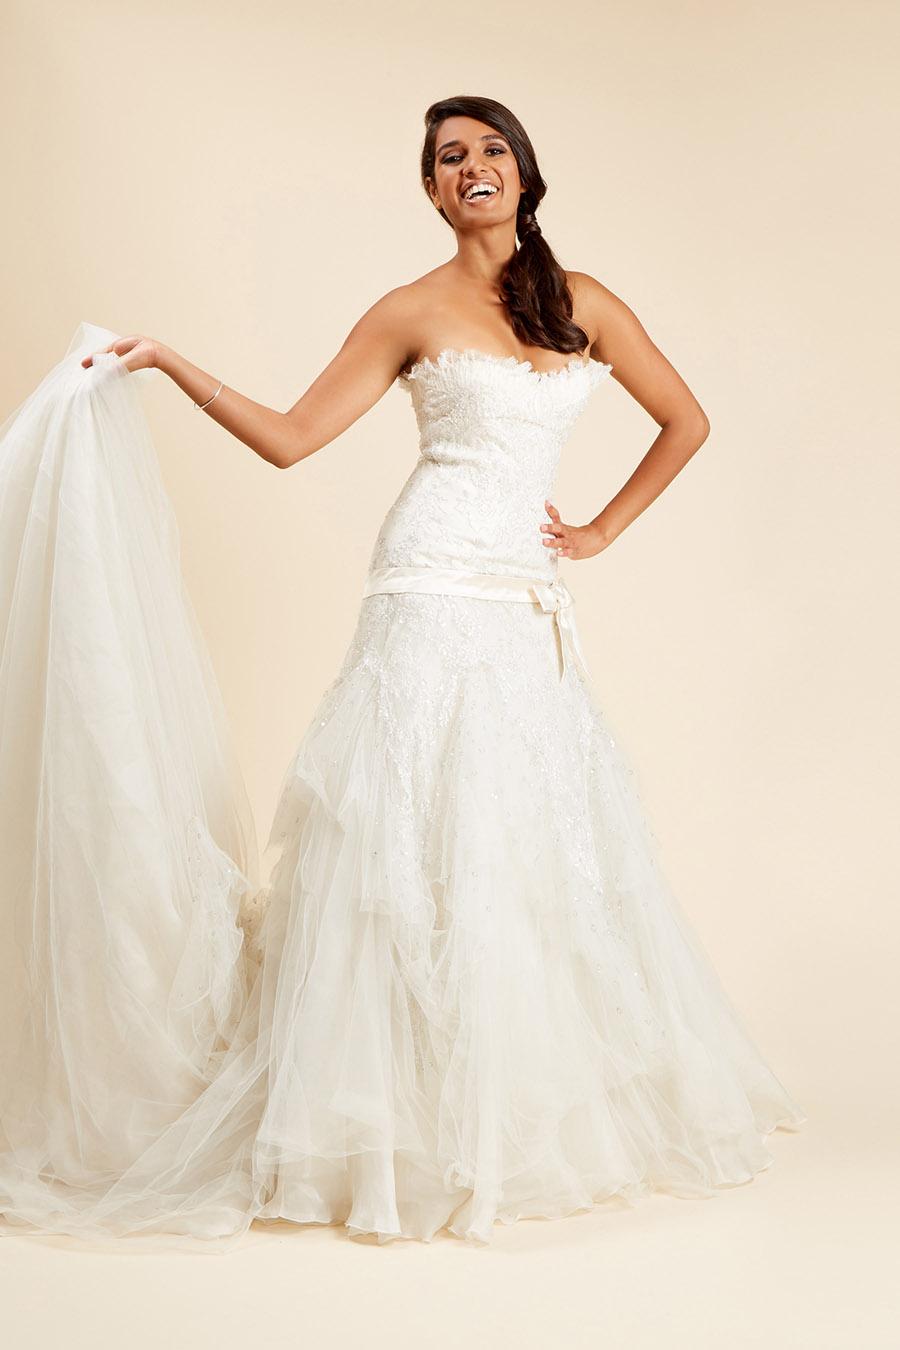 preloved wedding dresses charity wedding dress Brides Do Good UK (5)